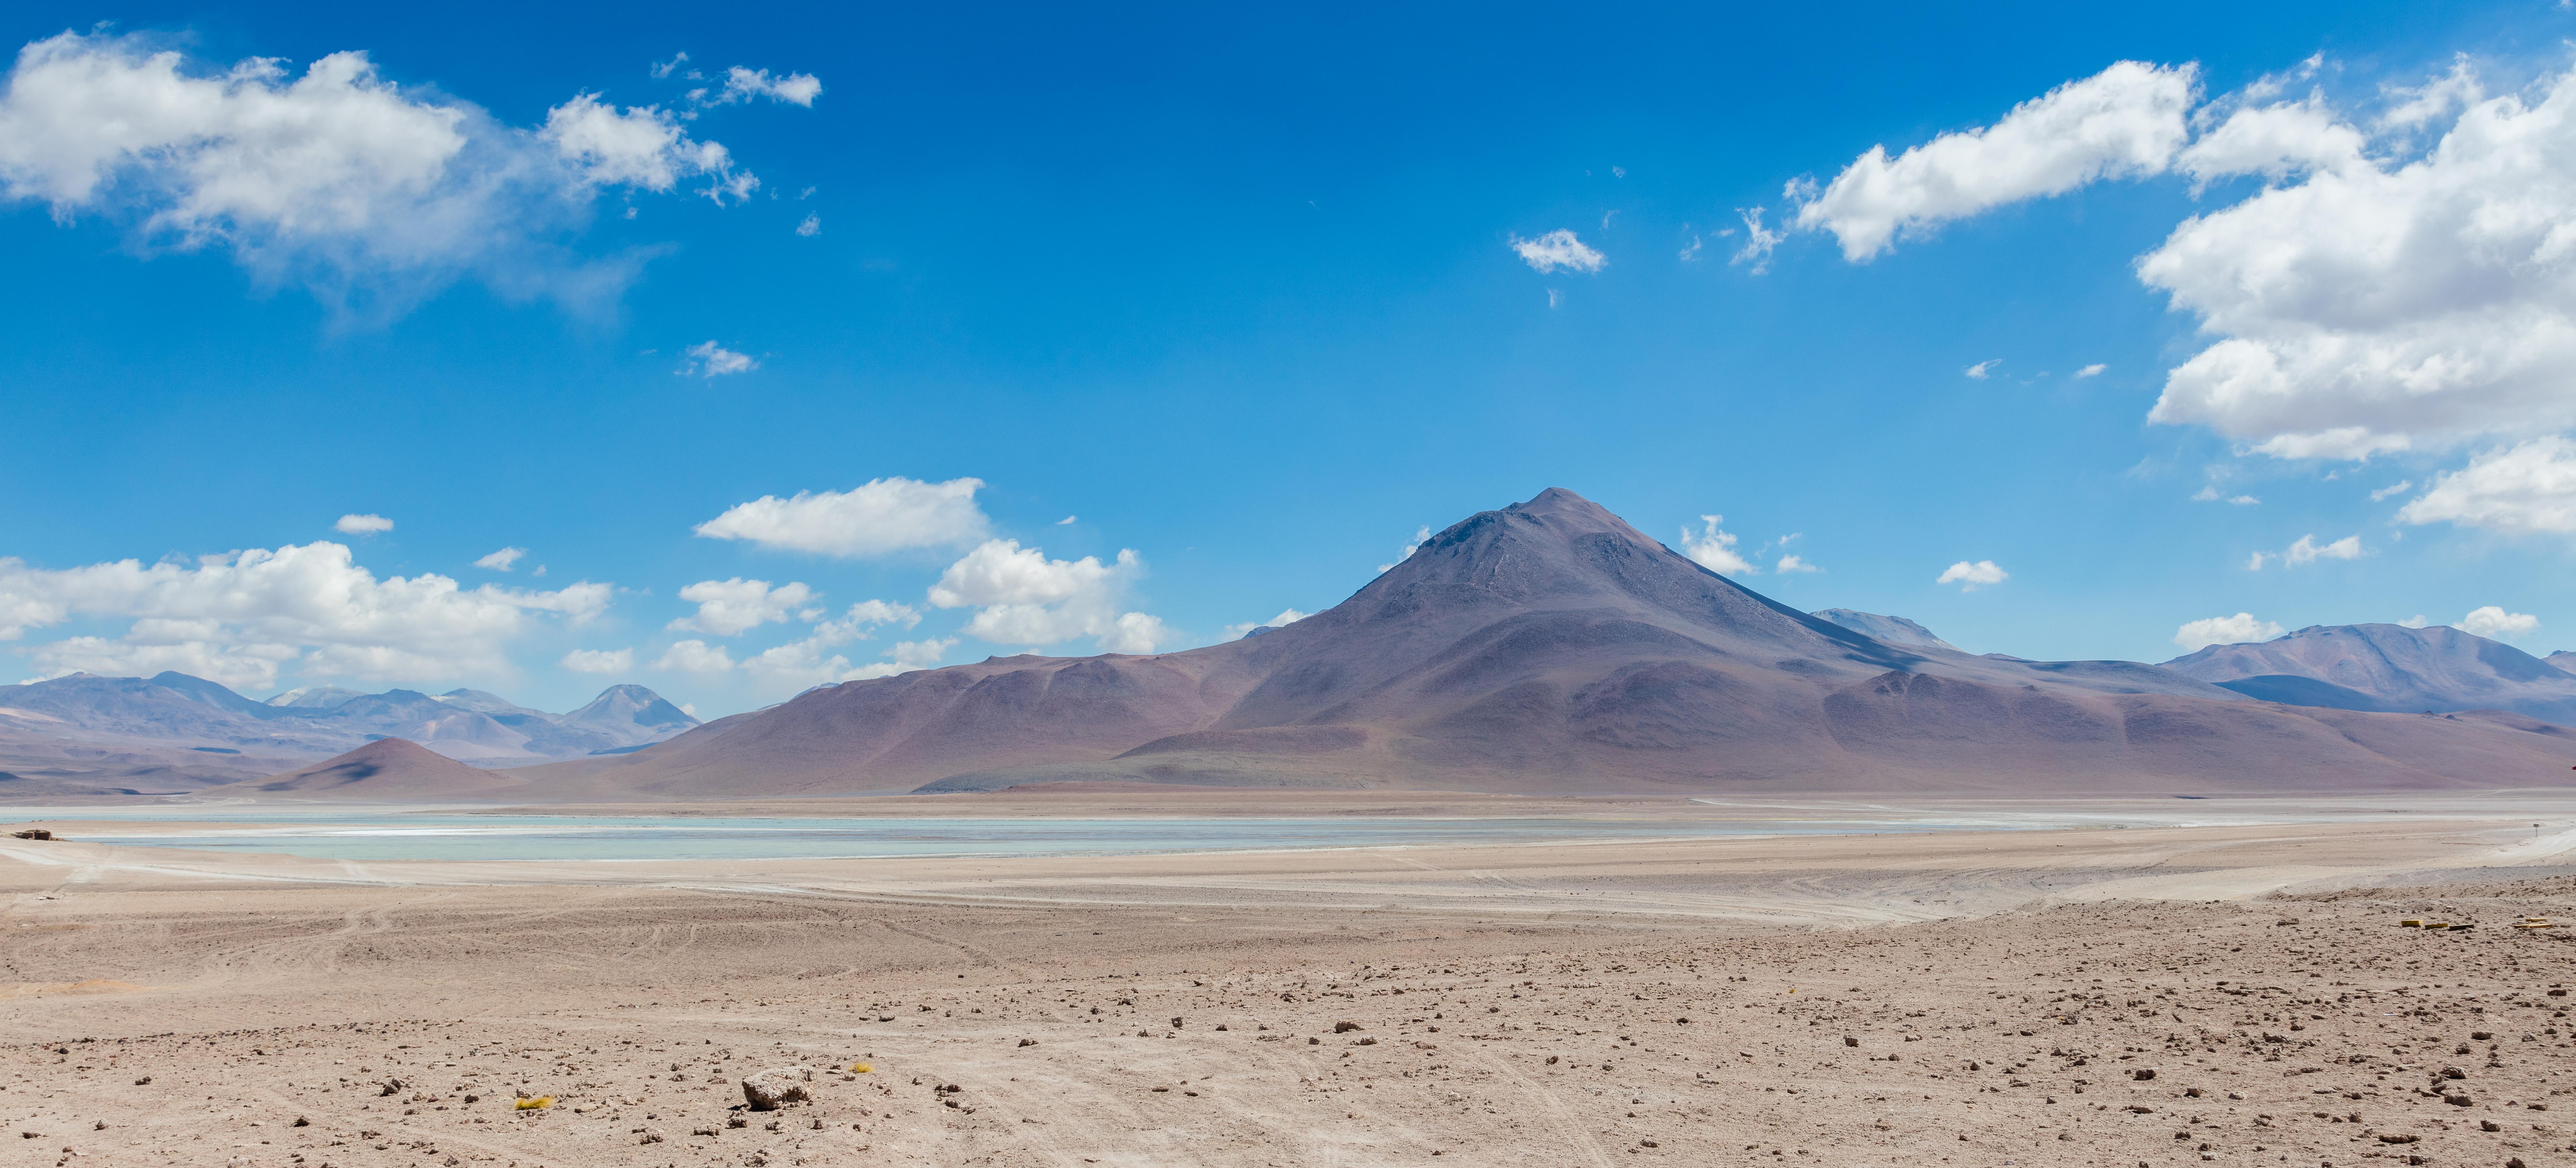 File:Laguna Blanca, Bolivia, 2016-02-02, DD 05.JPG ...  File:Laguna Bla...